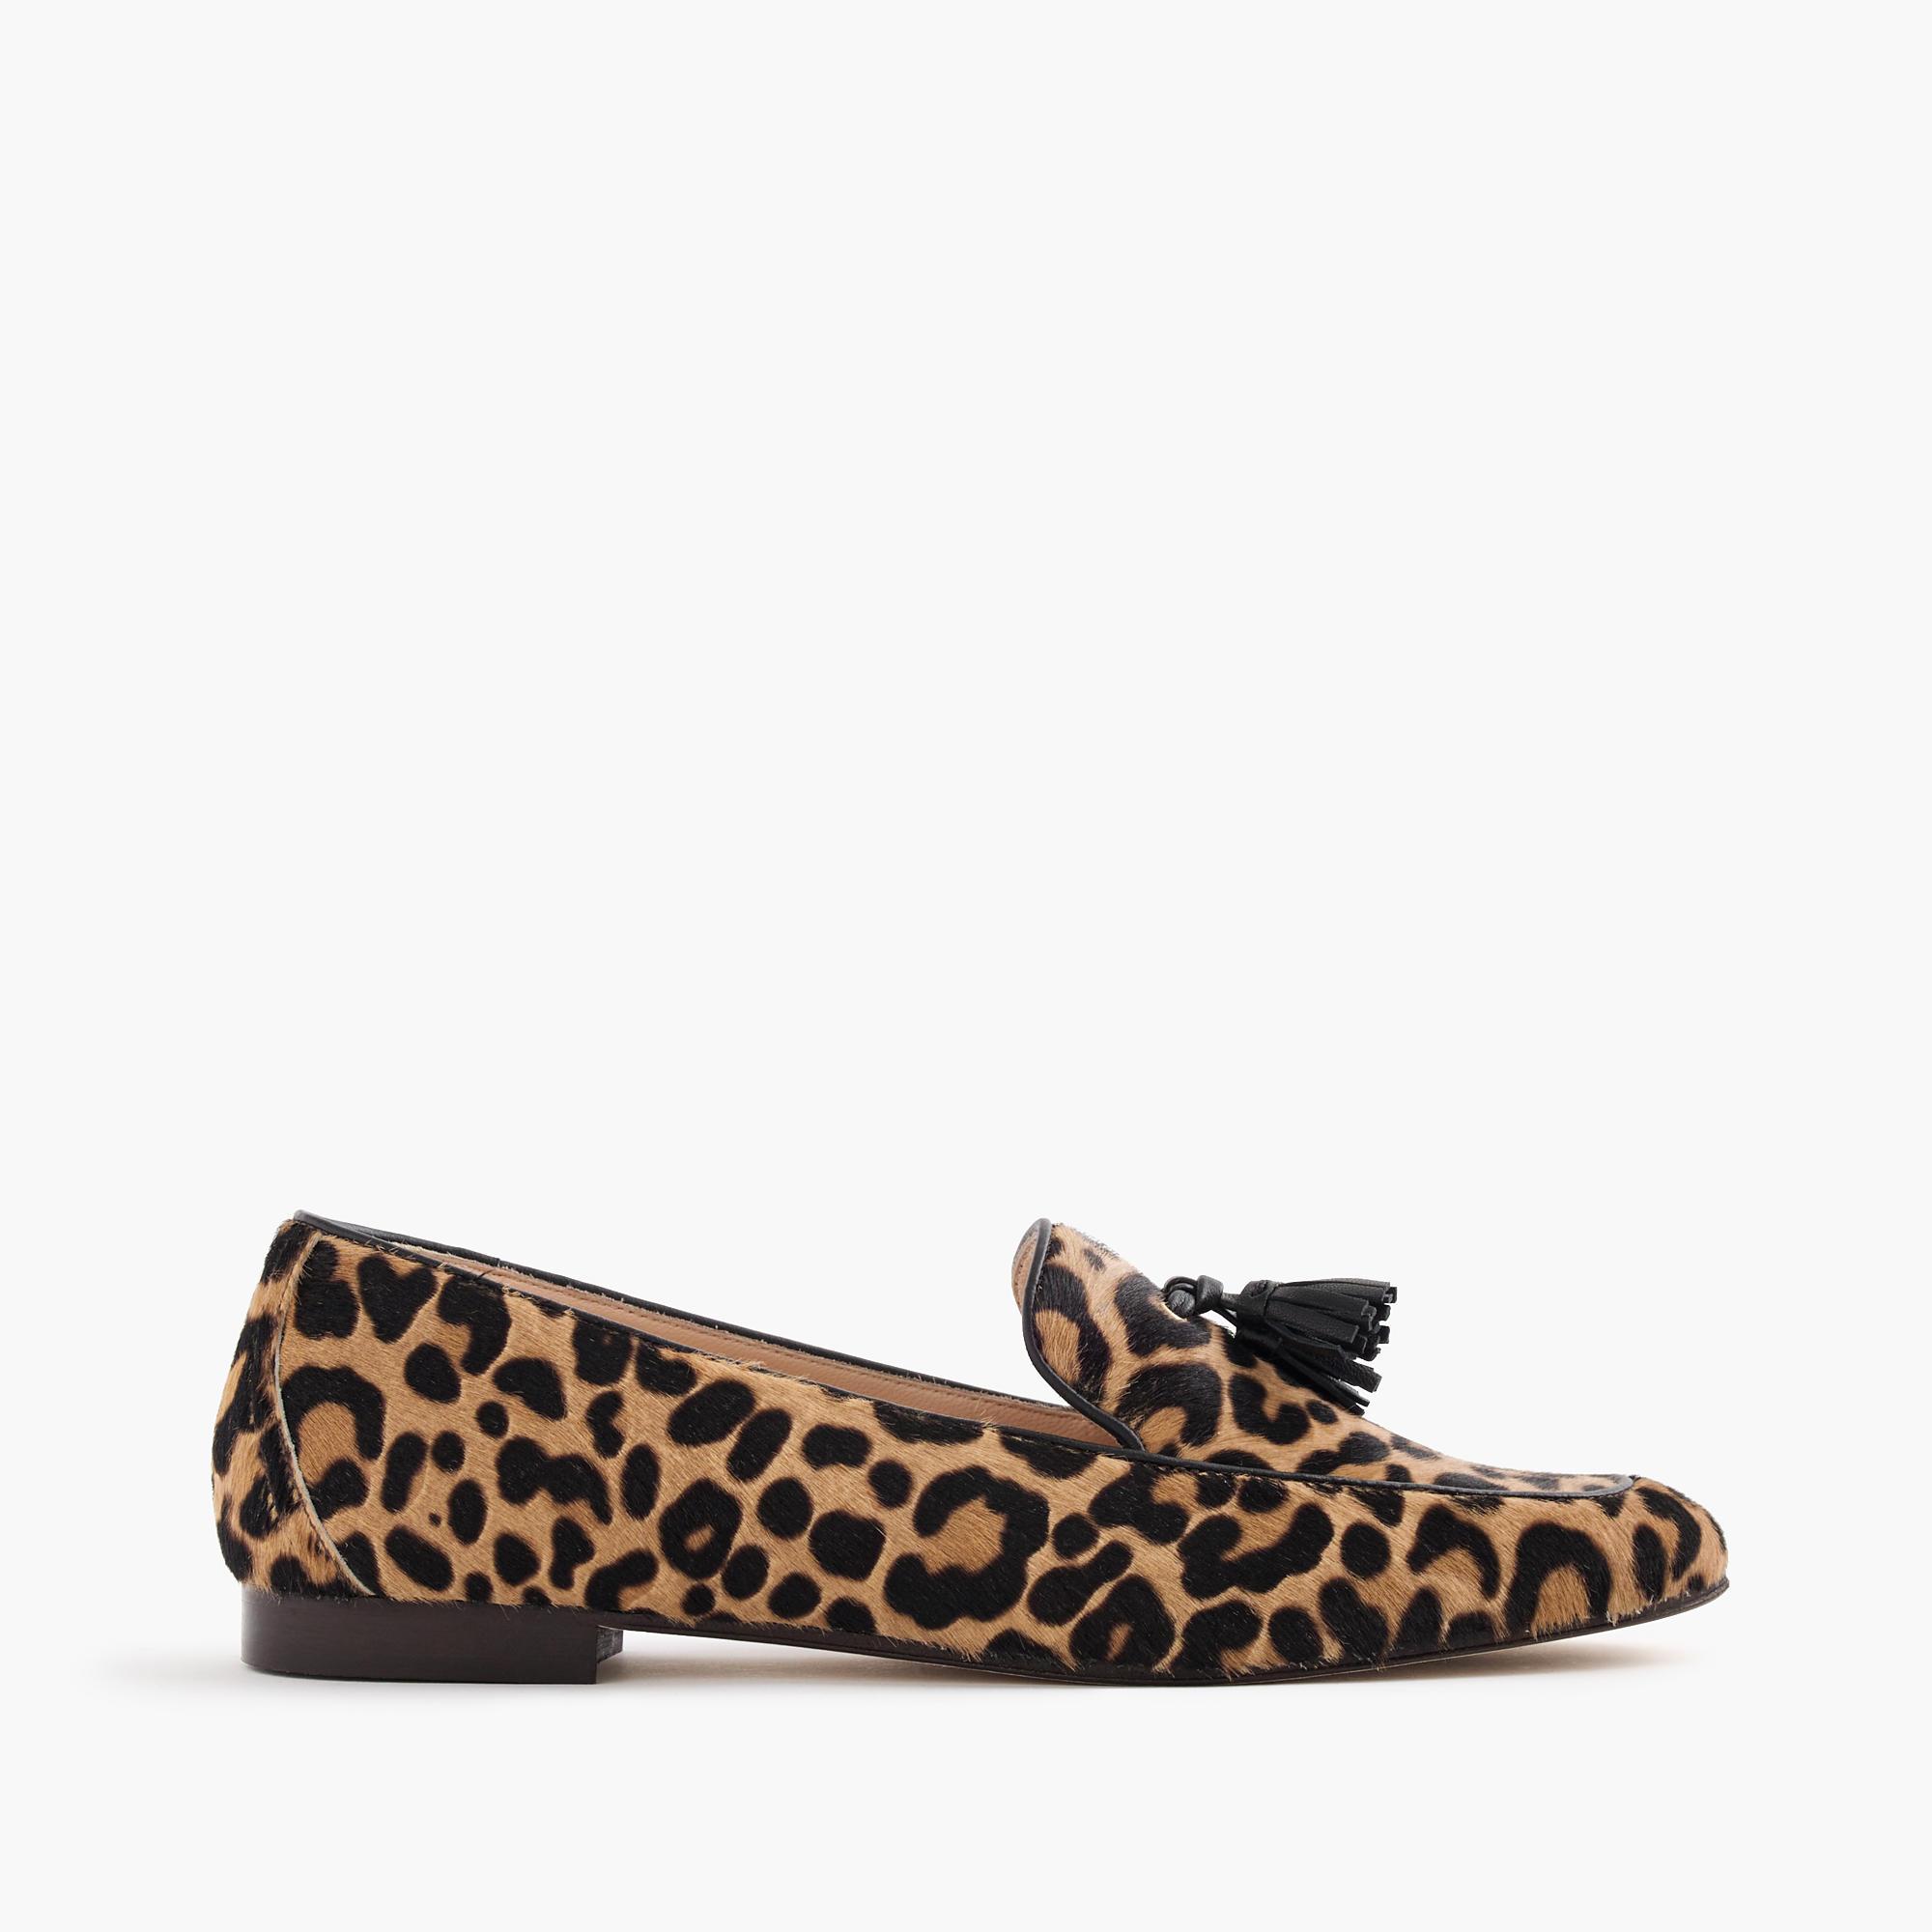 Leopard Shoes Loafer Size